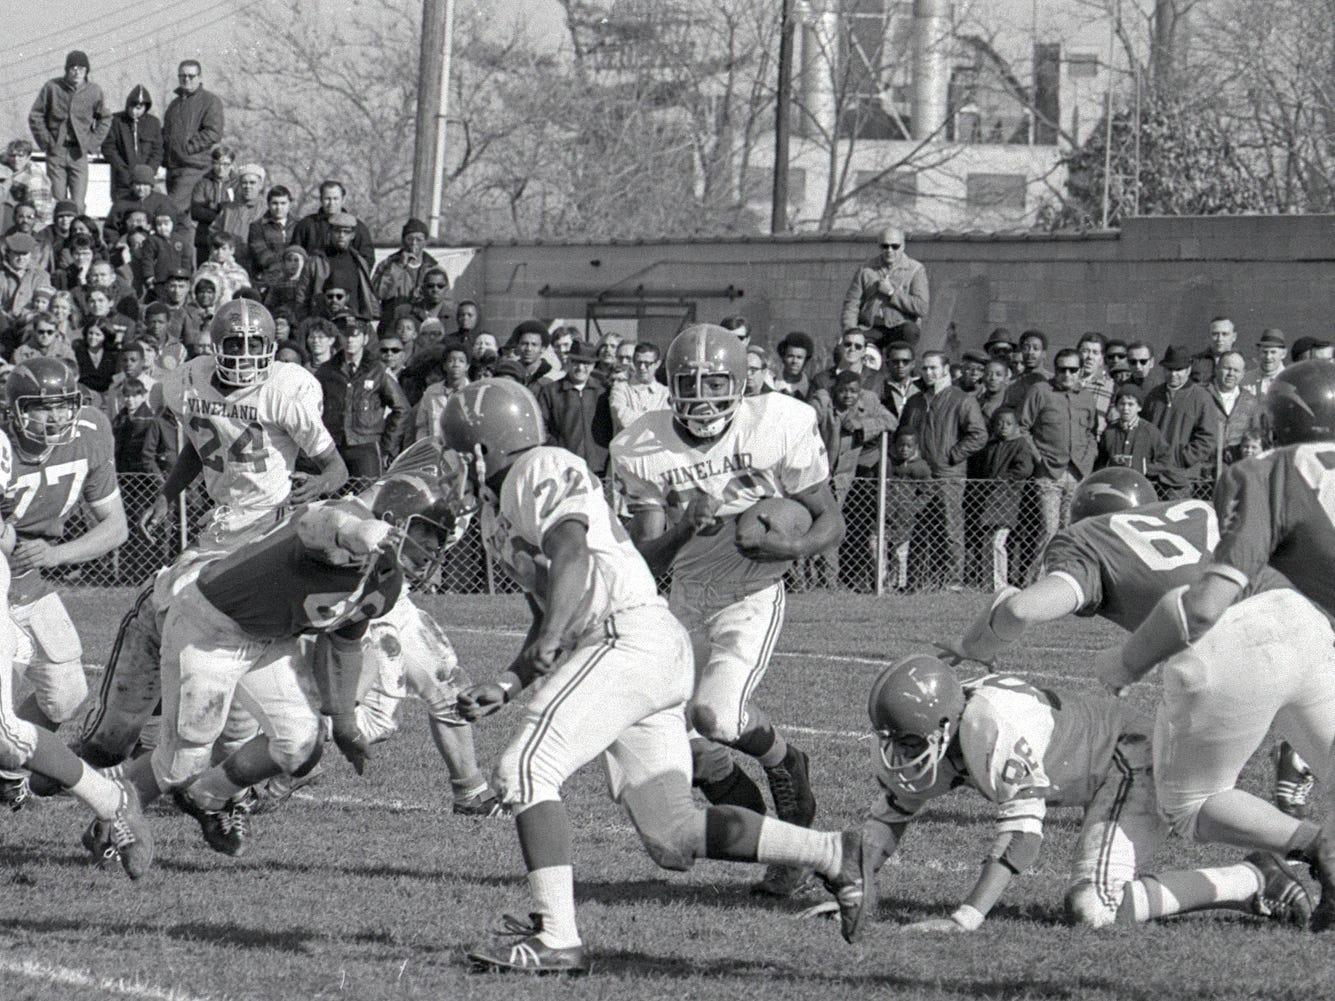 Football: Vineland vs. Millville in 1970.